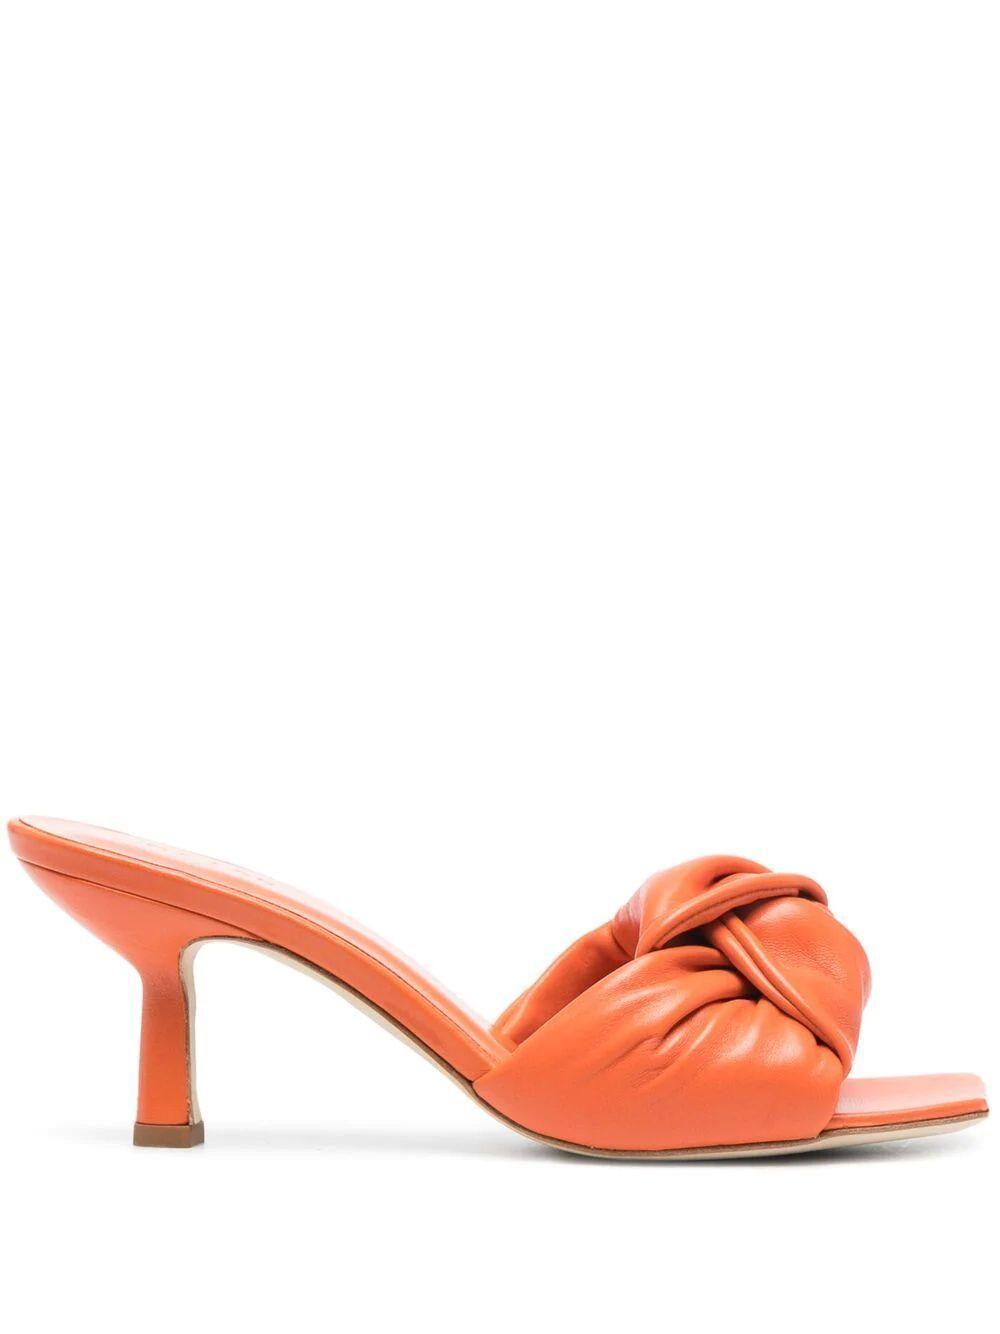 Lana Sandal Item # 21SSLAMPAPCRE